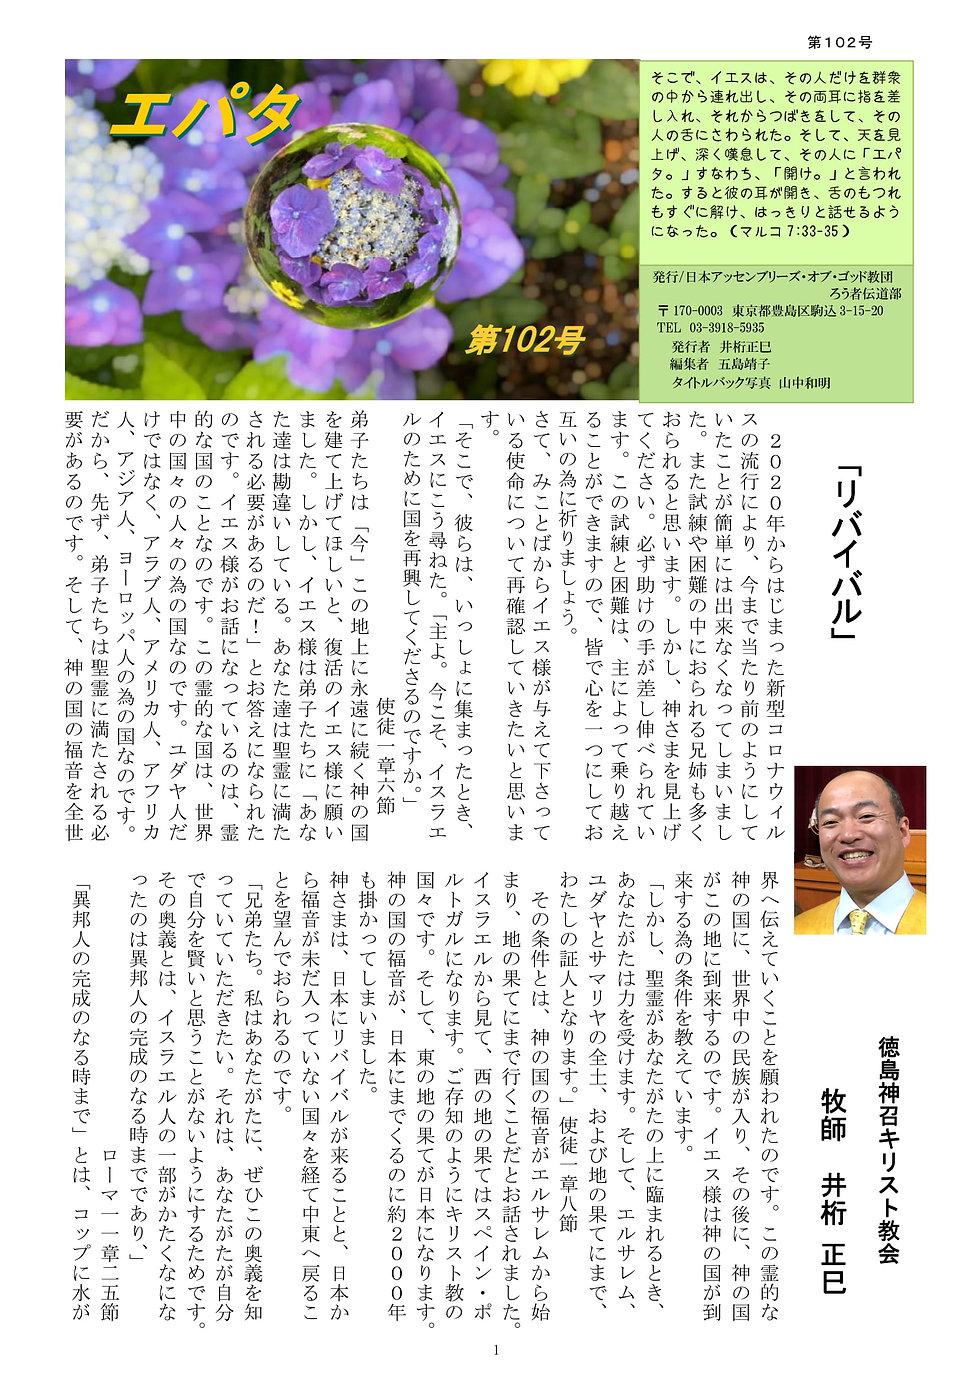 Taro-エパタ102 2021 6月15日-1.jpg